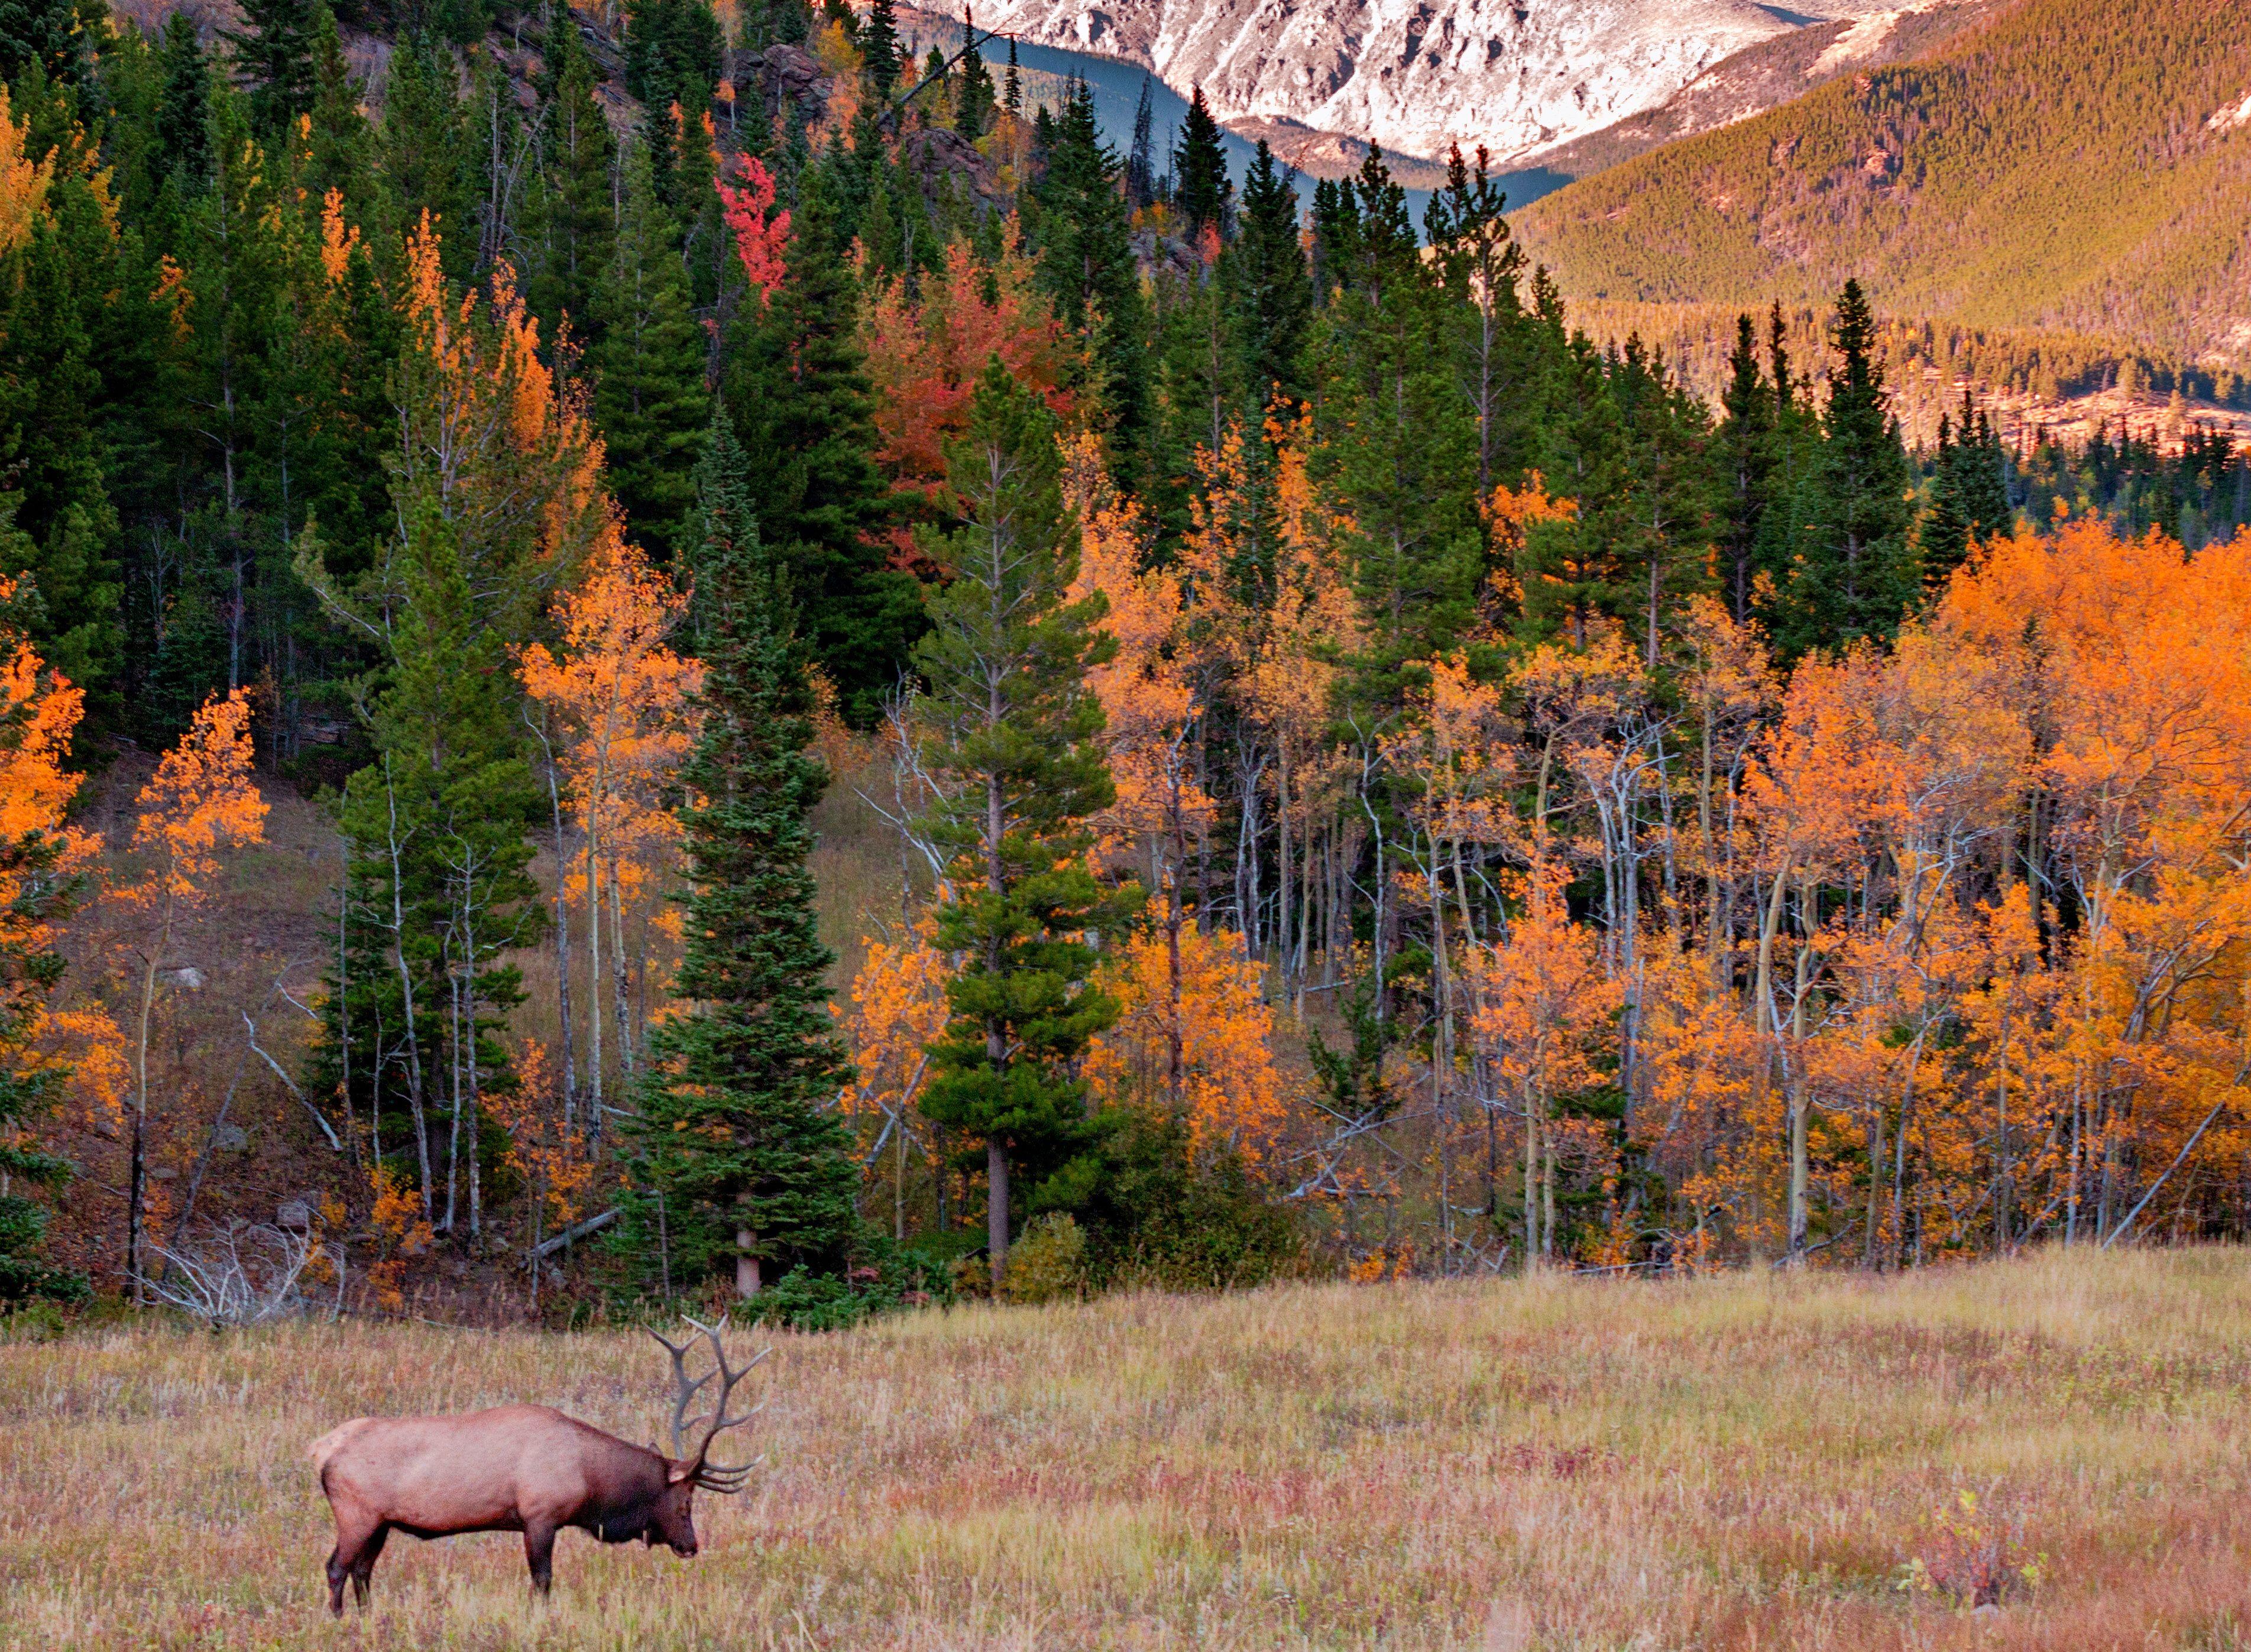 Elk At Rocky Mountain National Park Colorado Top Vacation Destinations Rocky Mountain National Park Sandboarding